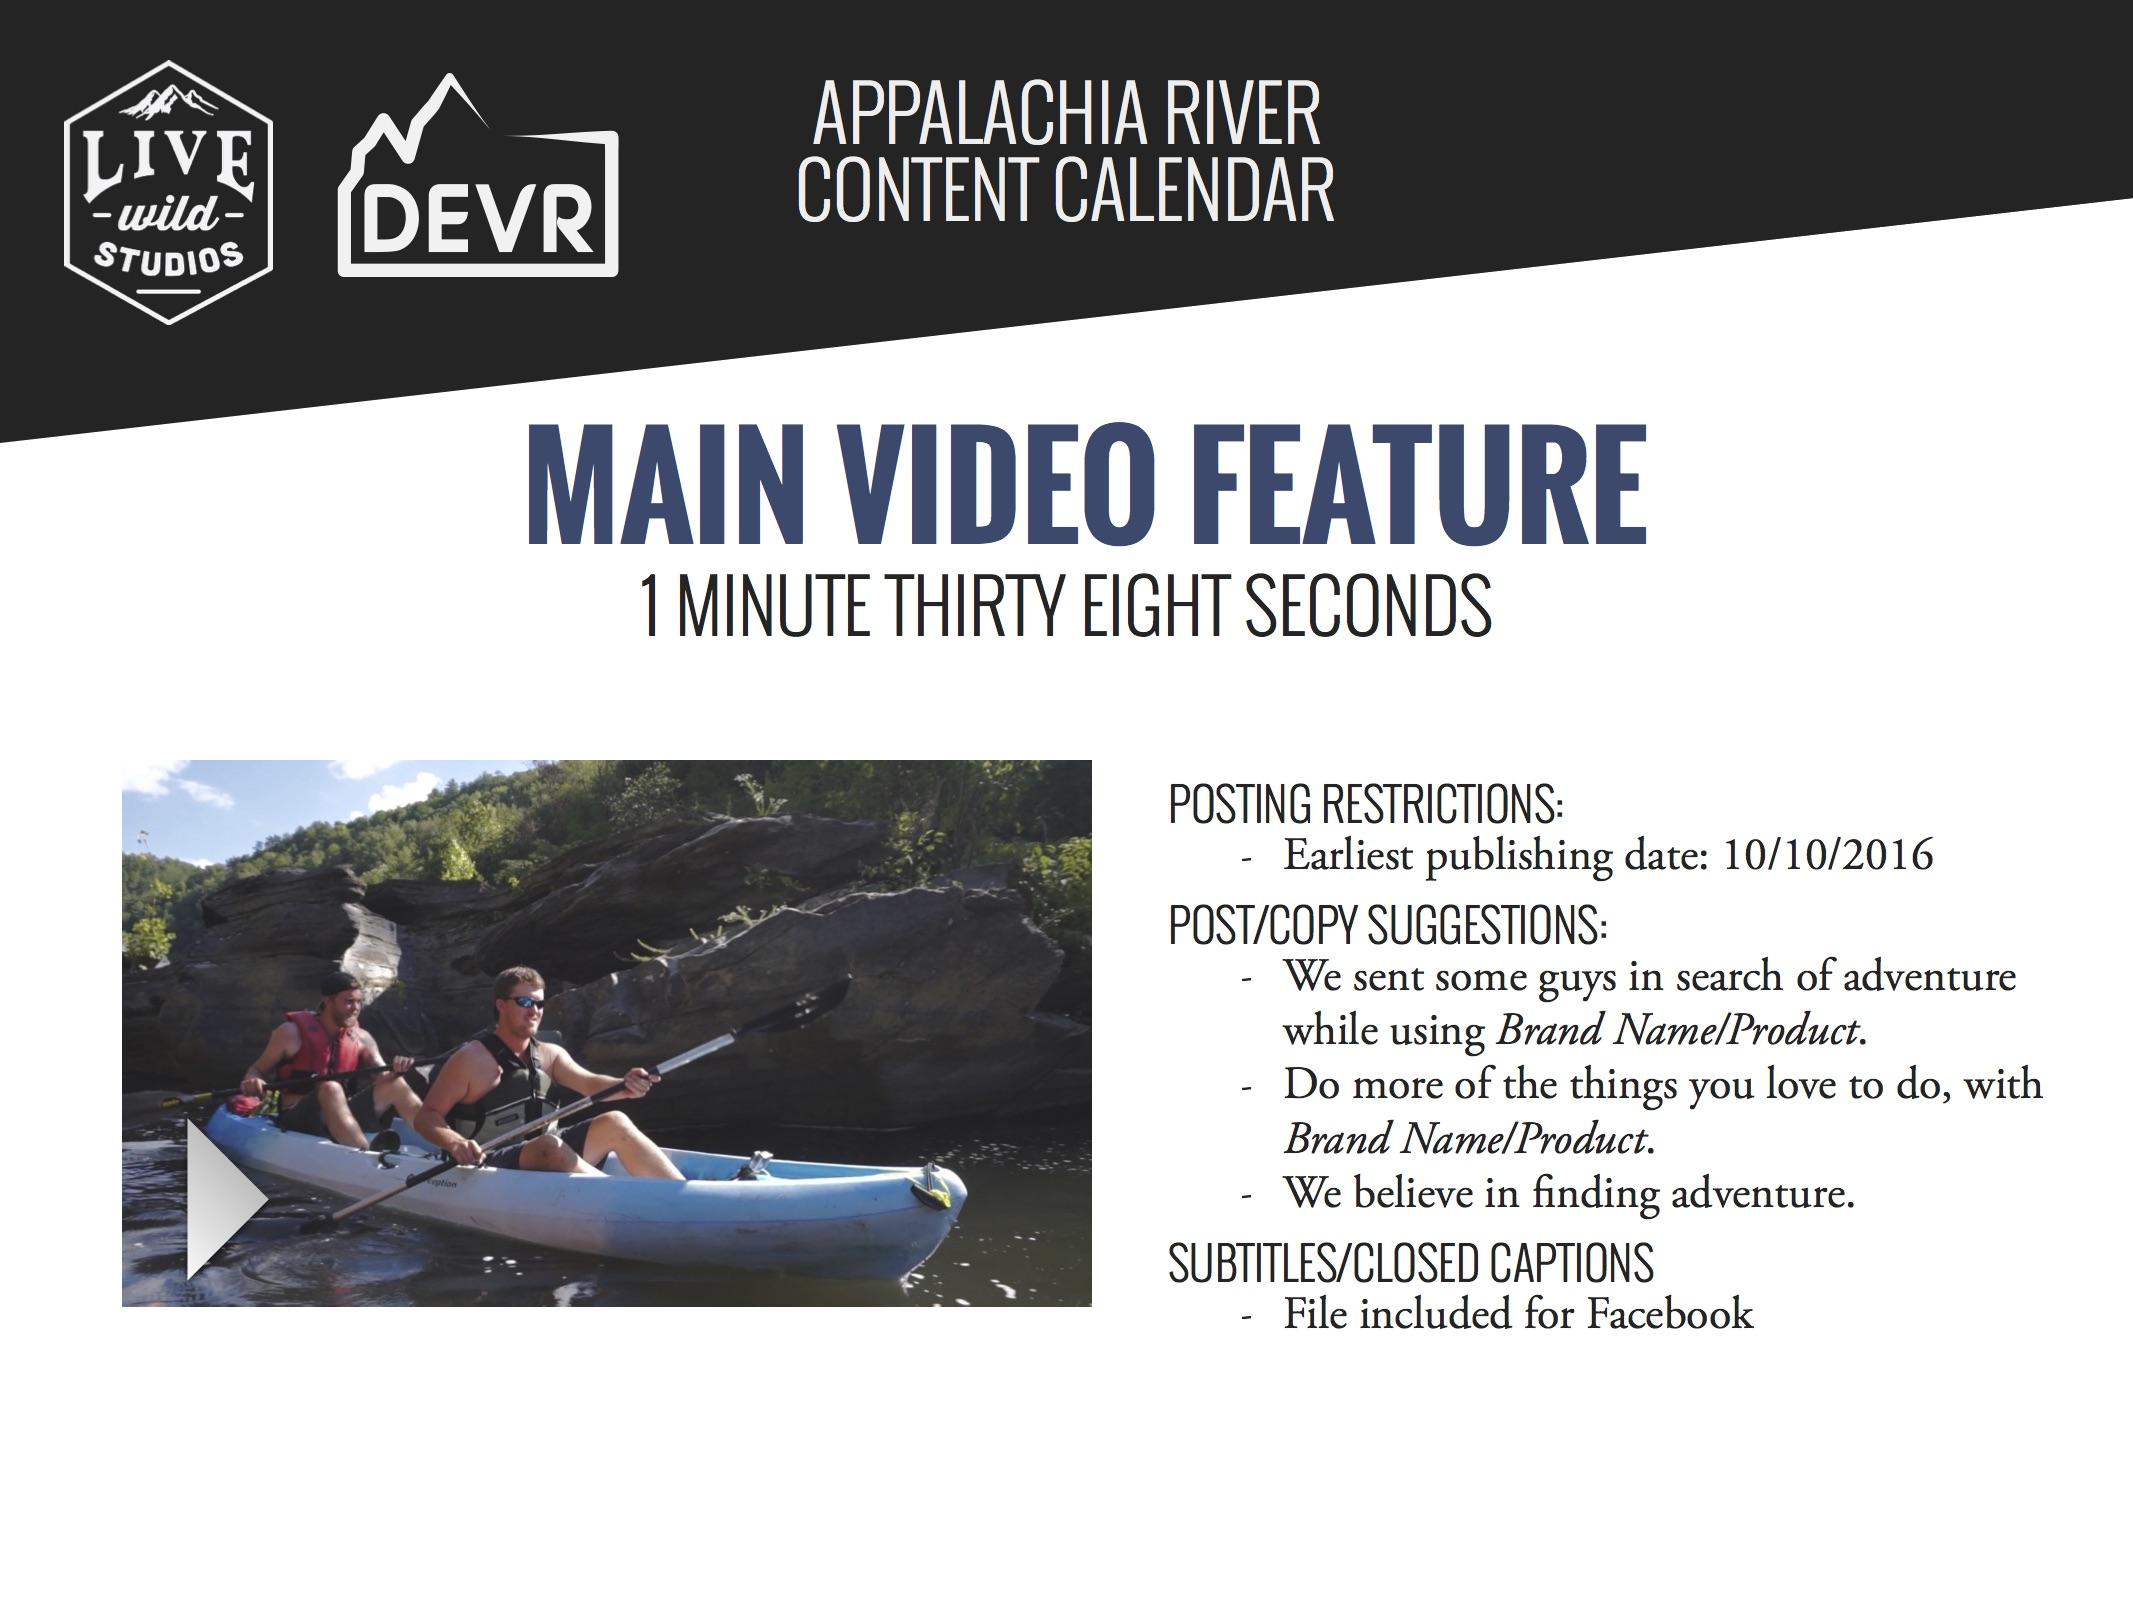 Appalachia River Adventure 2016 Campaign Guide 7.jpg